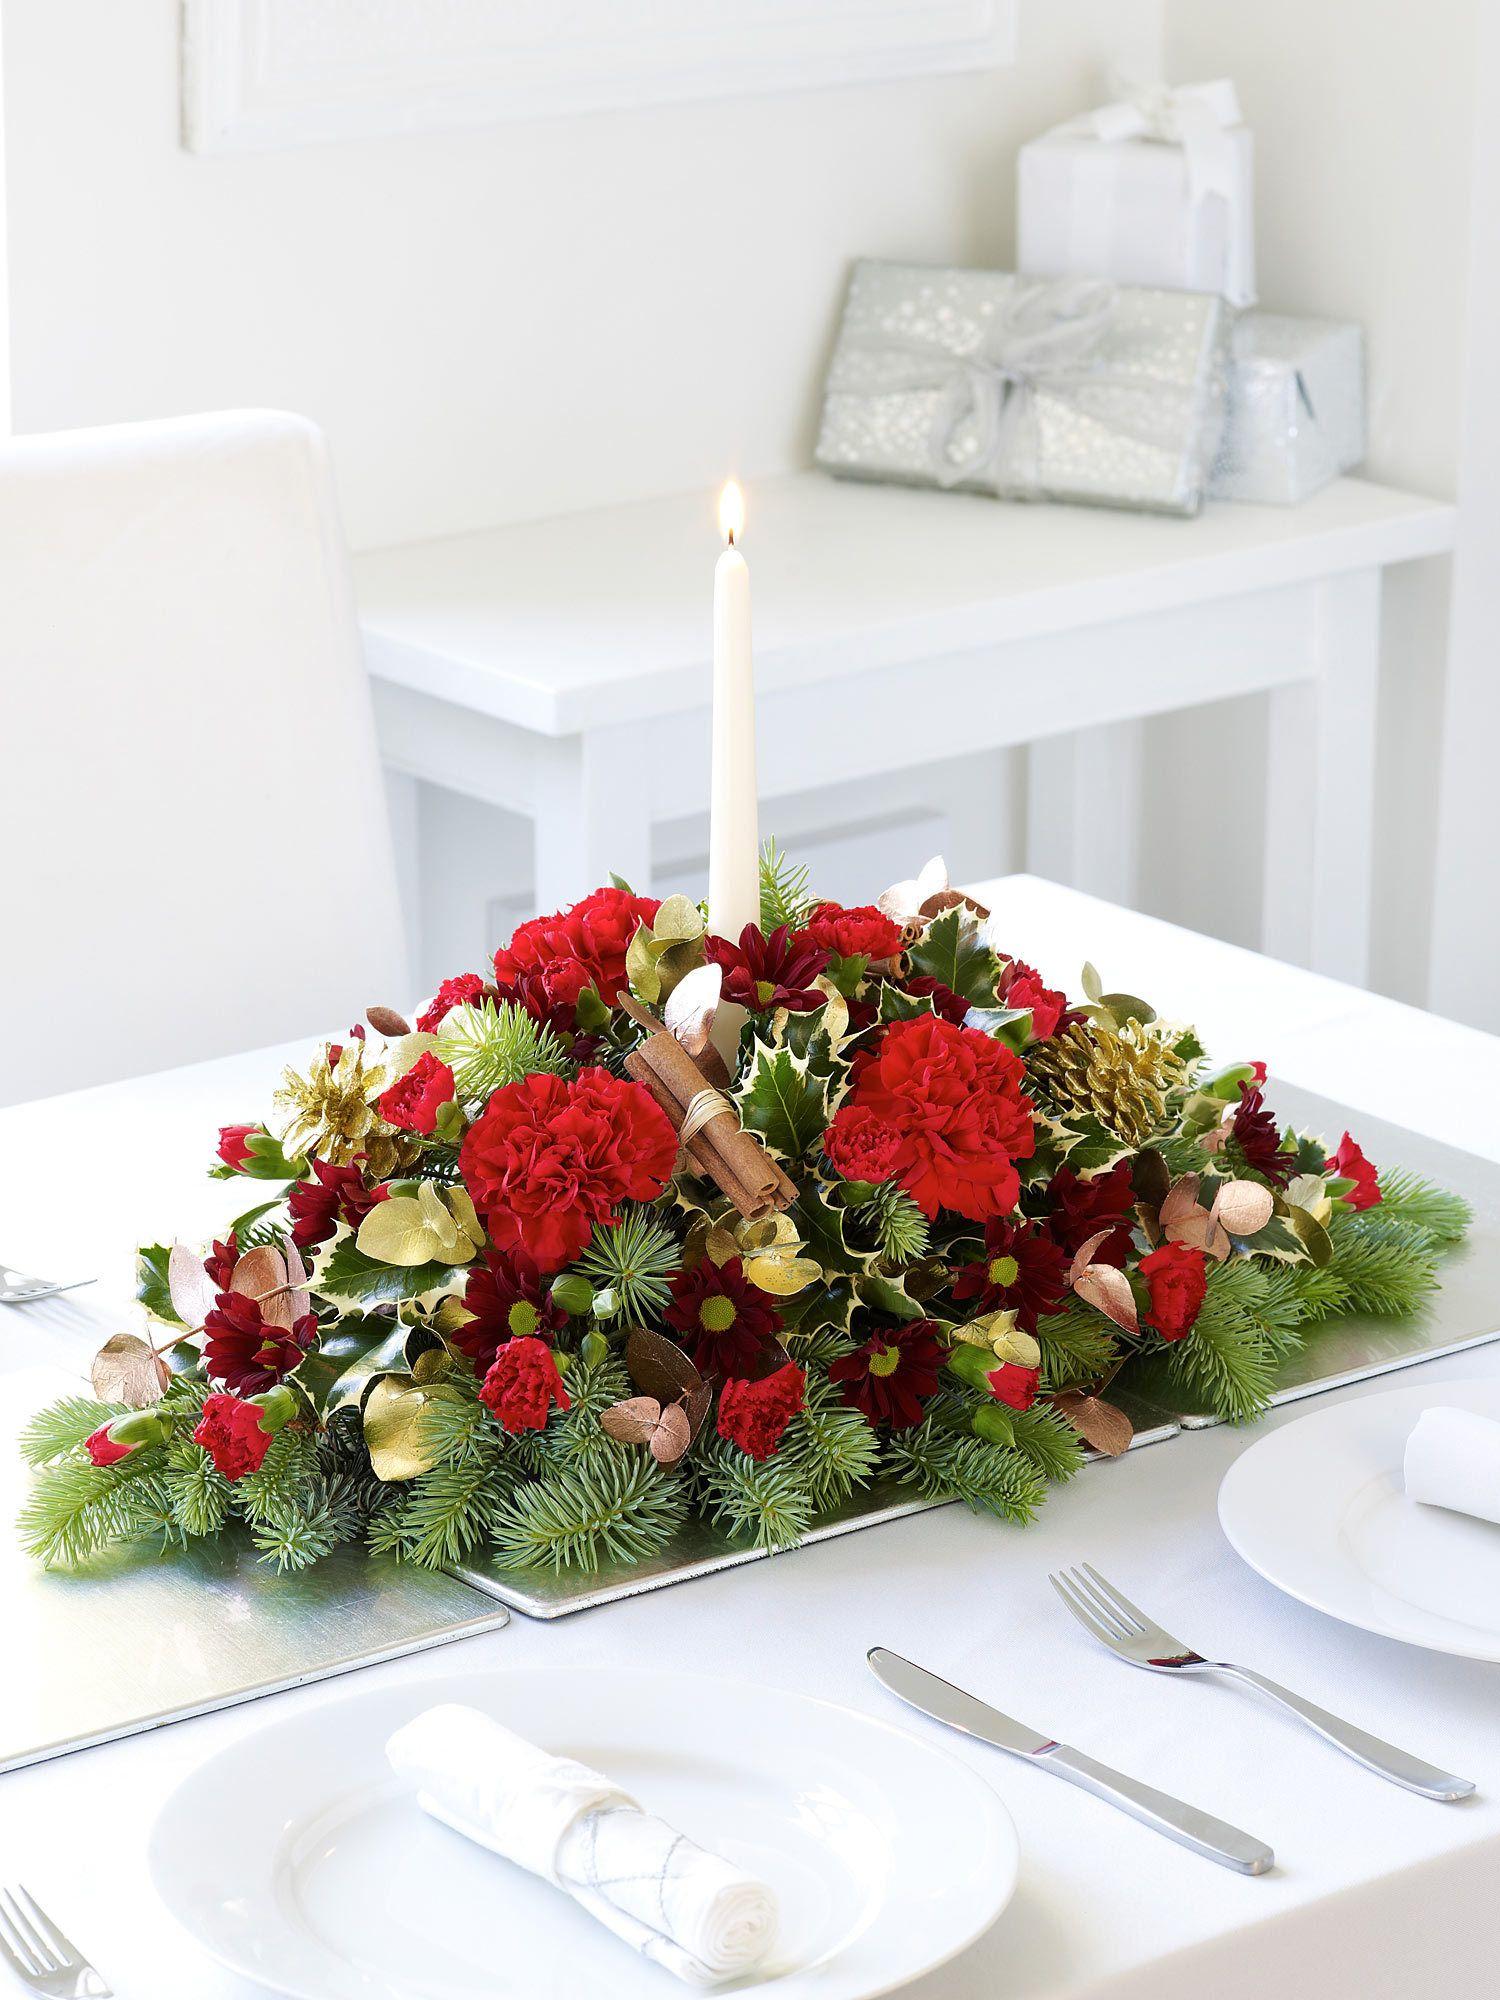 Christmas Candle Arrangement Interflora Christmas Flowers Candle Arrangements Christmas Flower Delivery